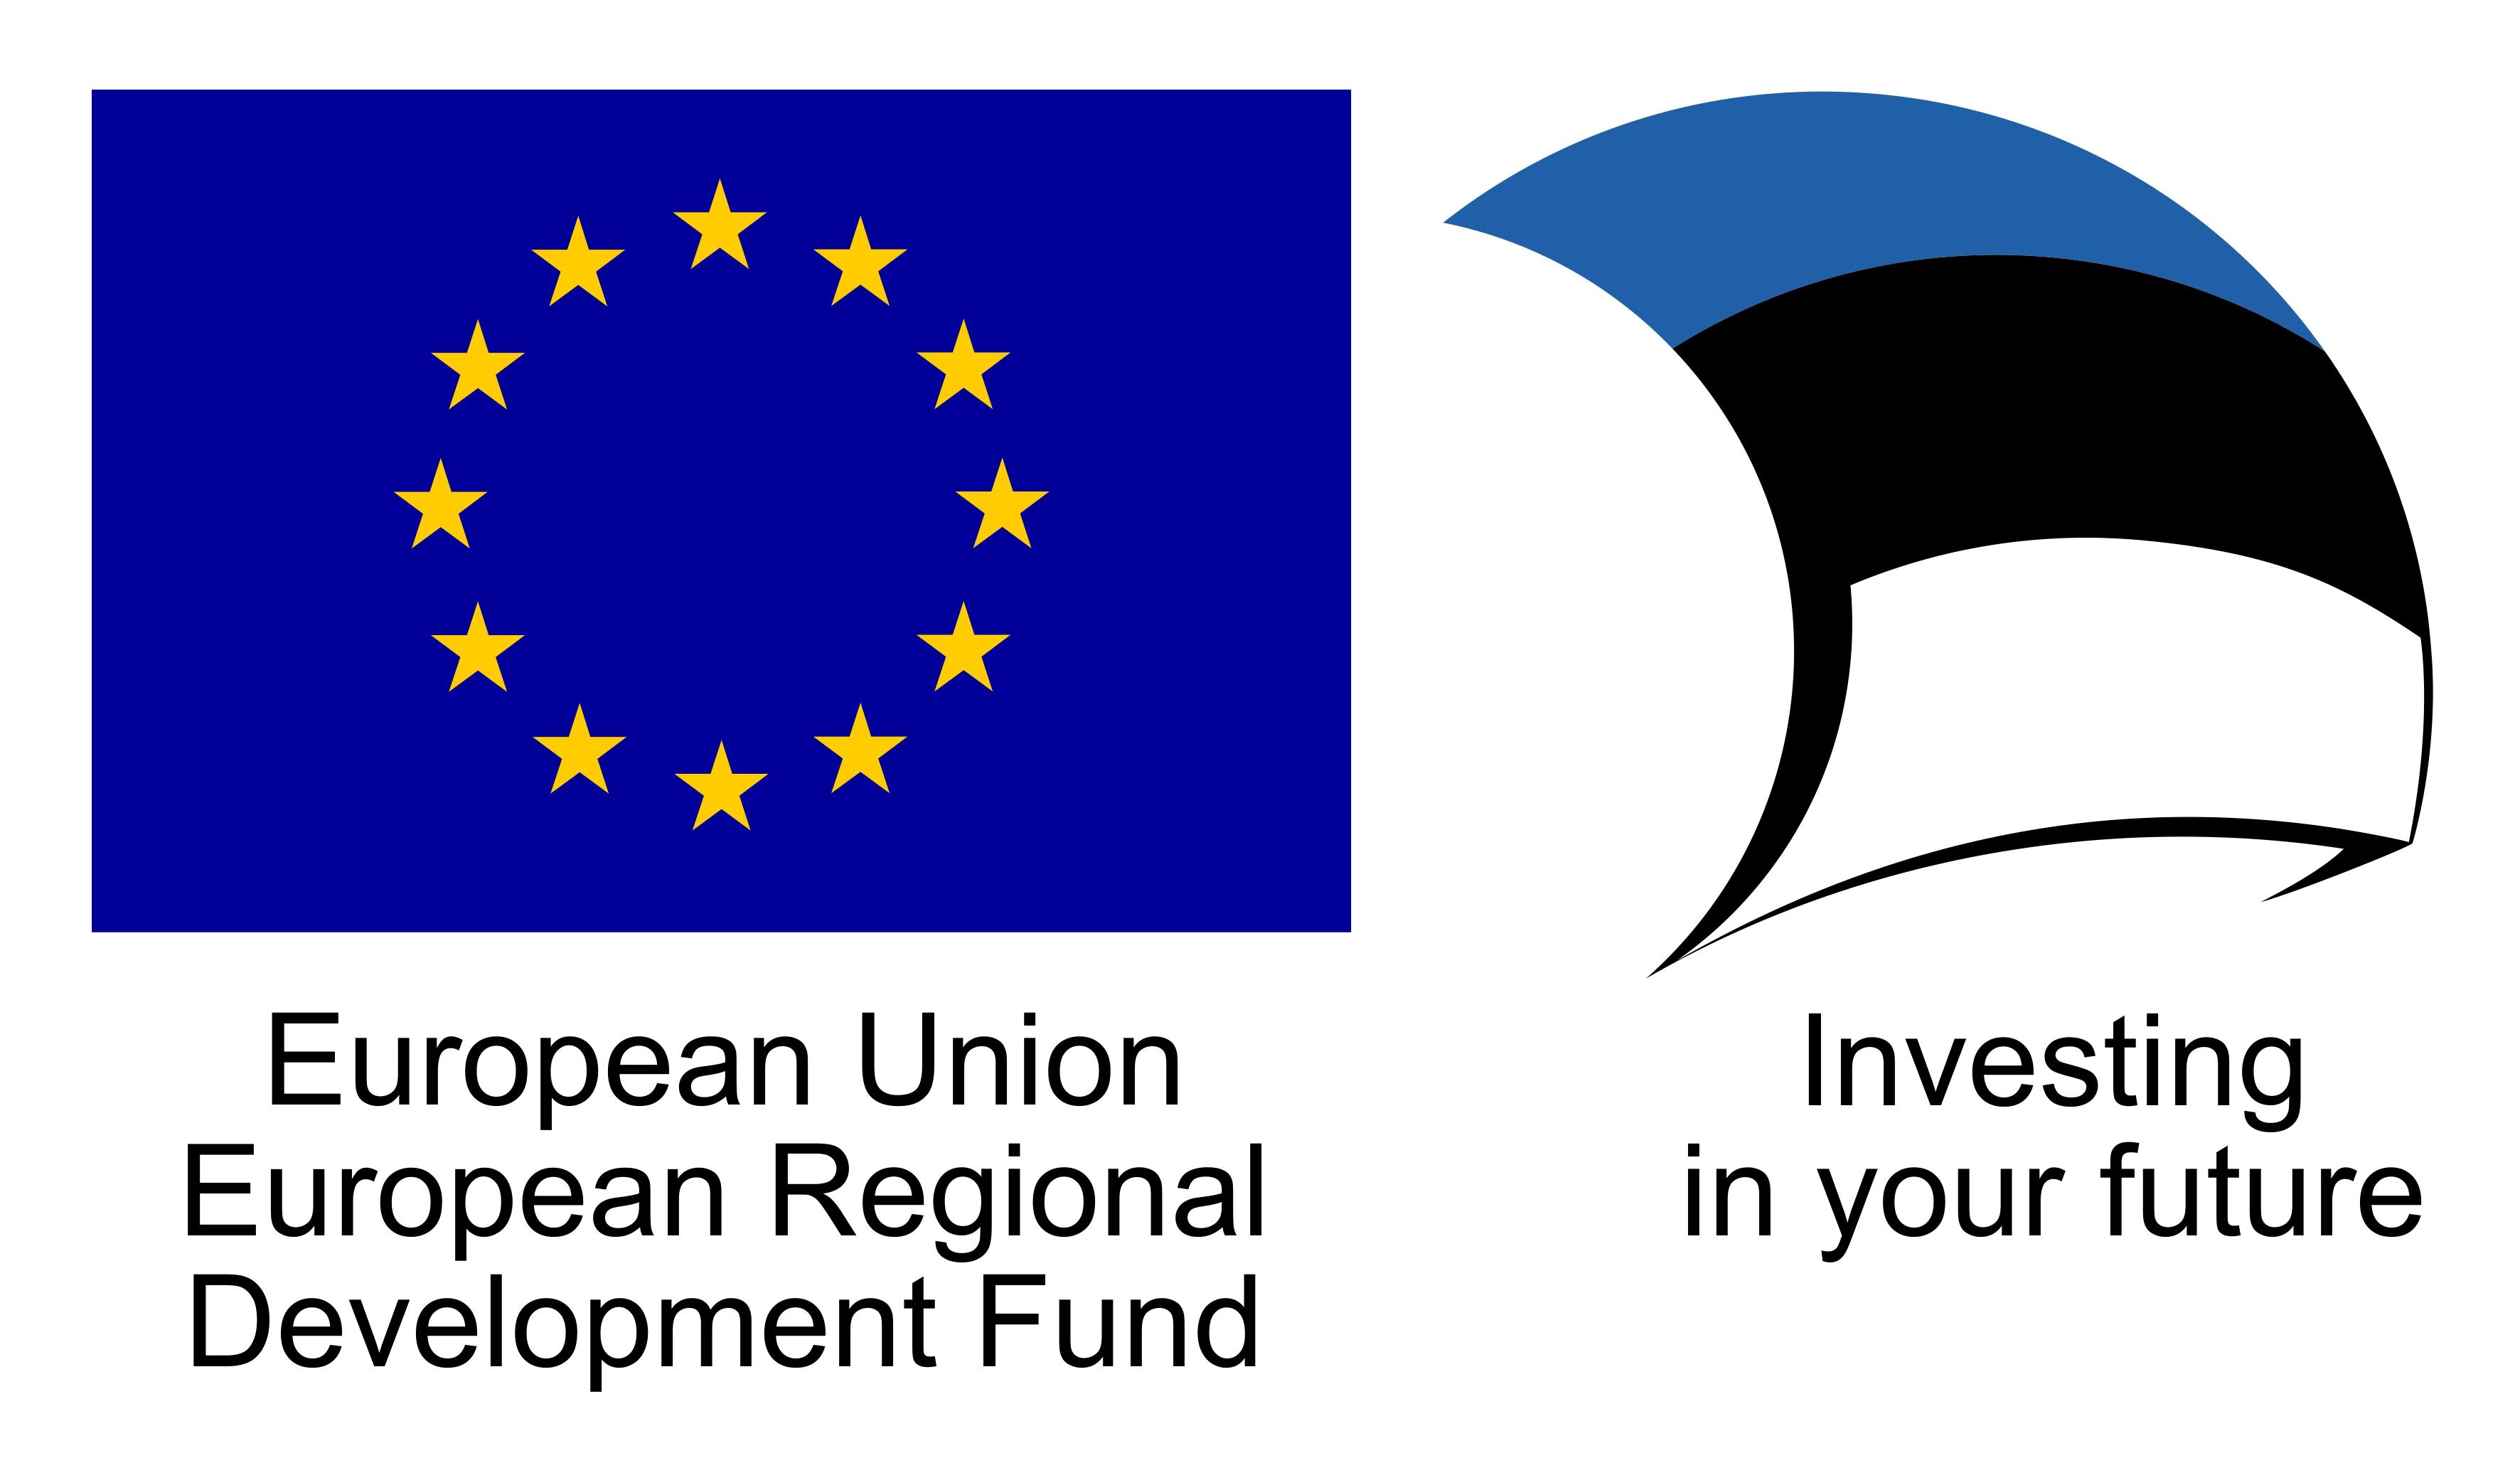 Funded by European Union European Regional Development Fund